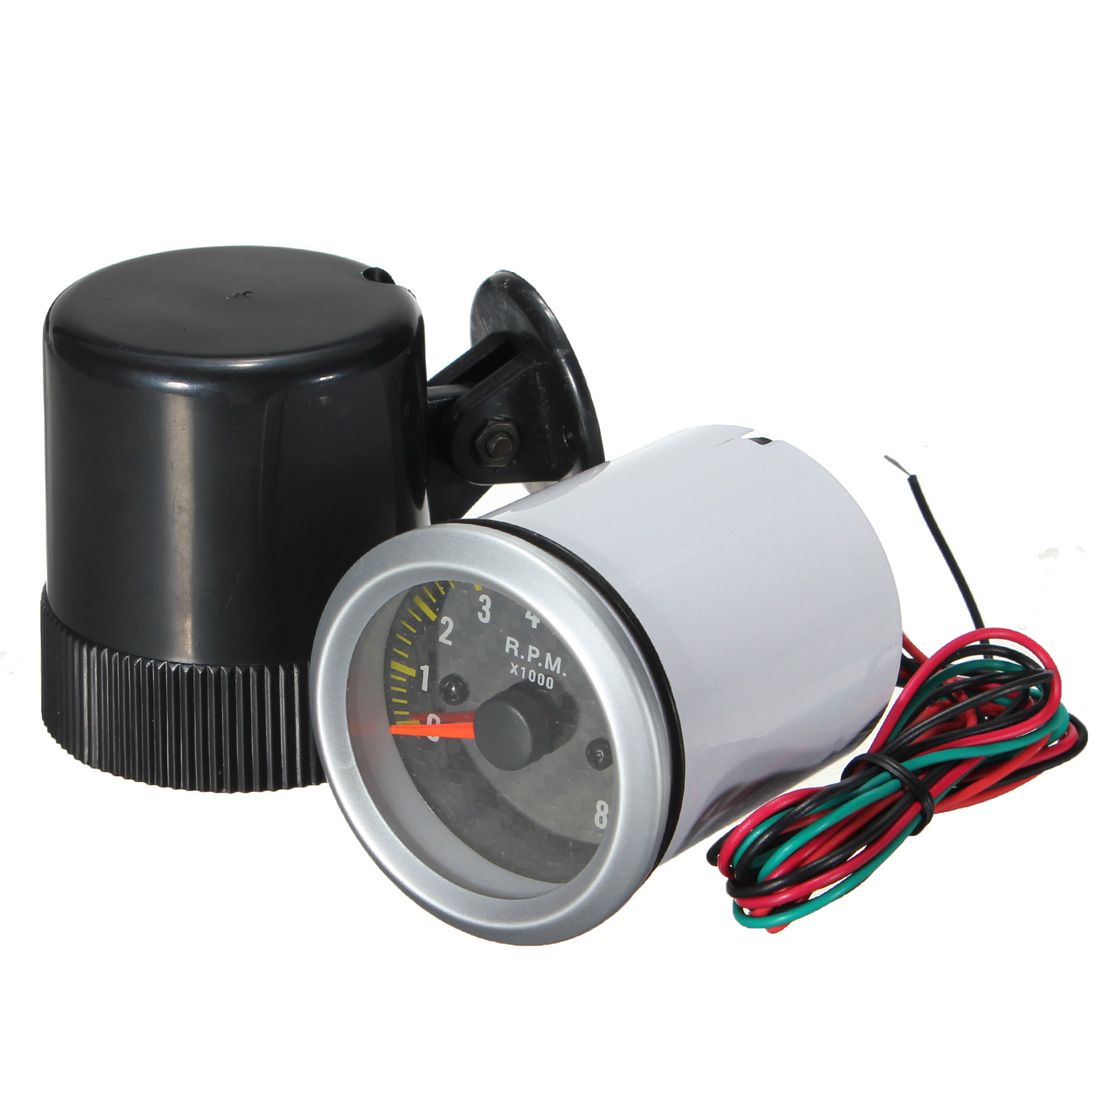 2 inch 52mm 0 - 8000 RPM Rev Tacho Gauge Car Tachometer Carbon Fiber Face Yellow LED